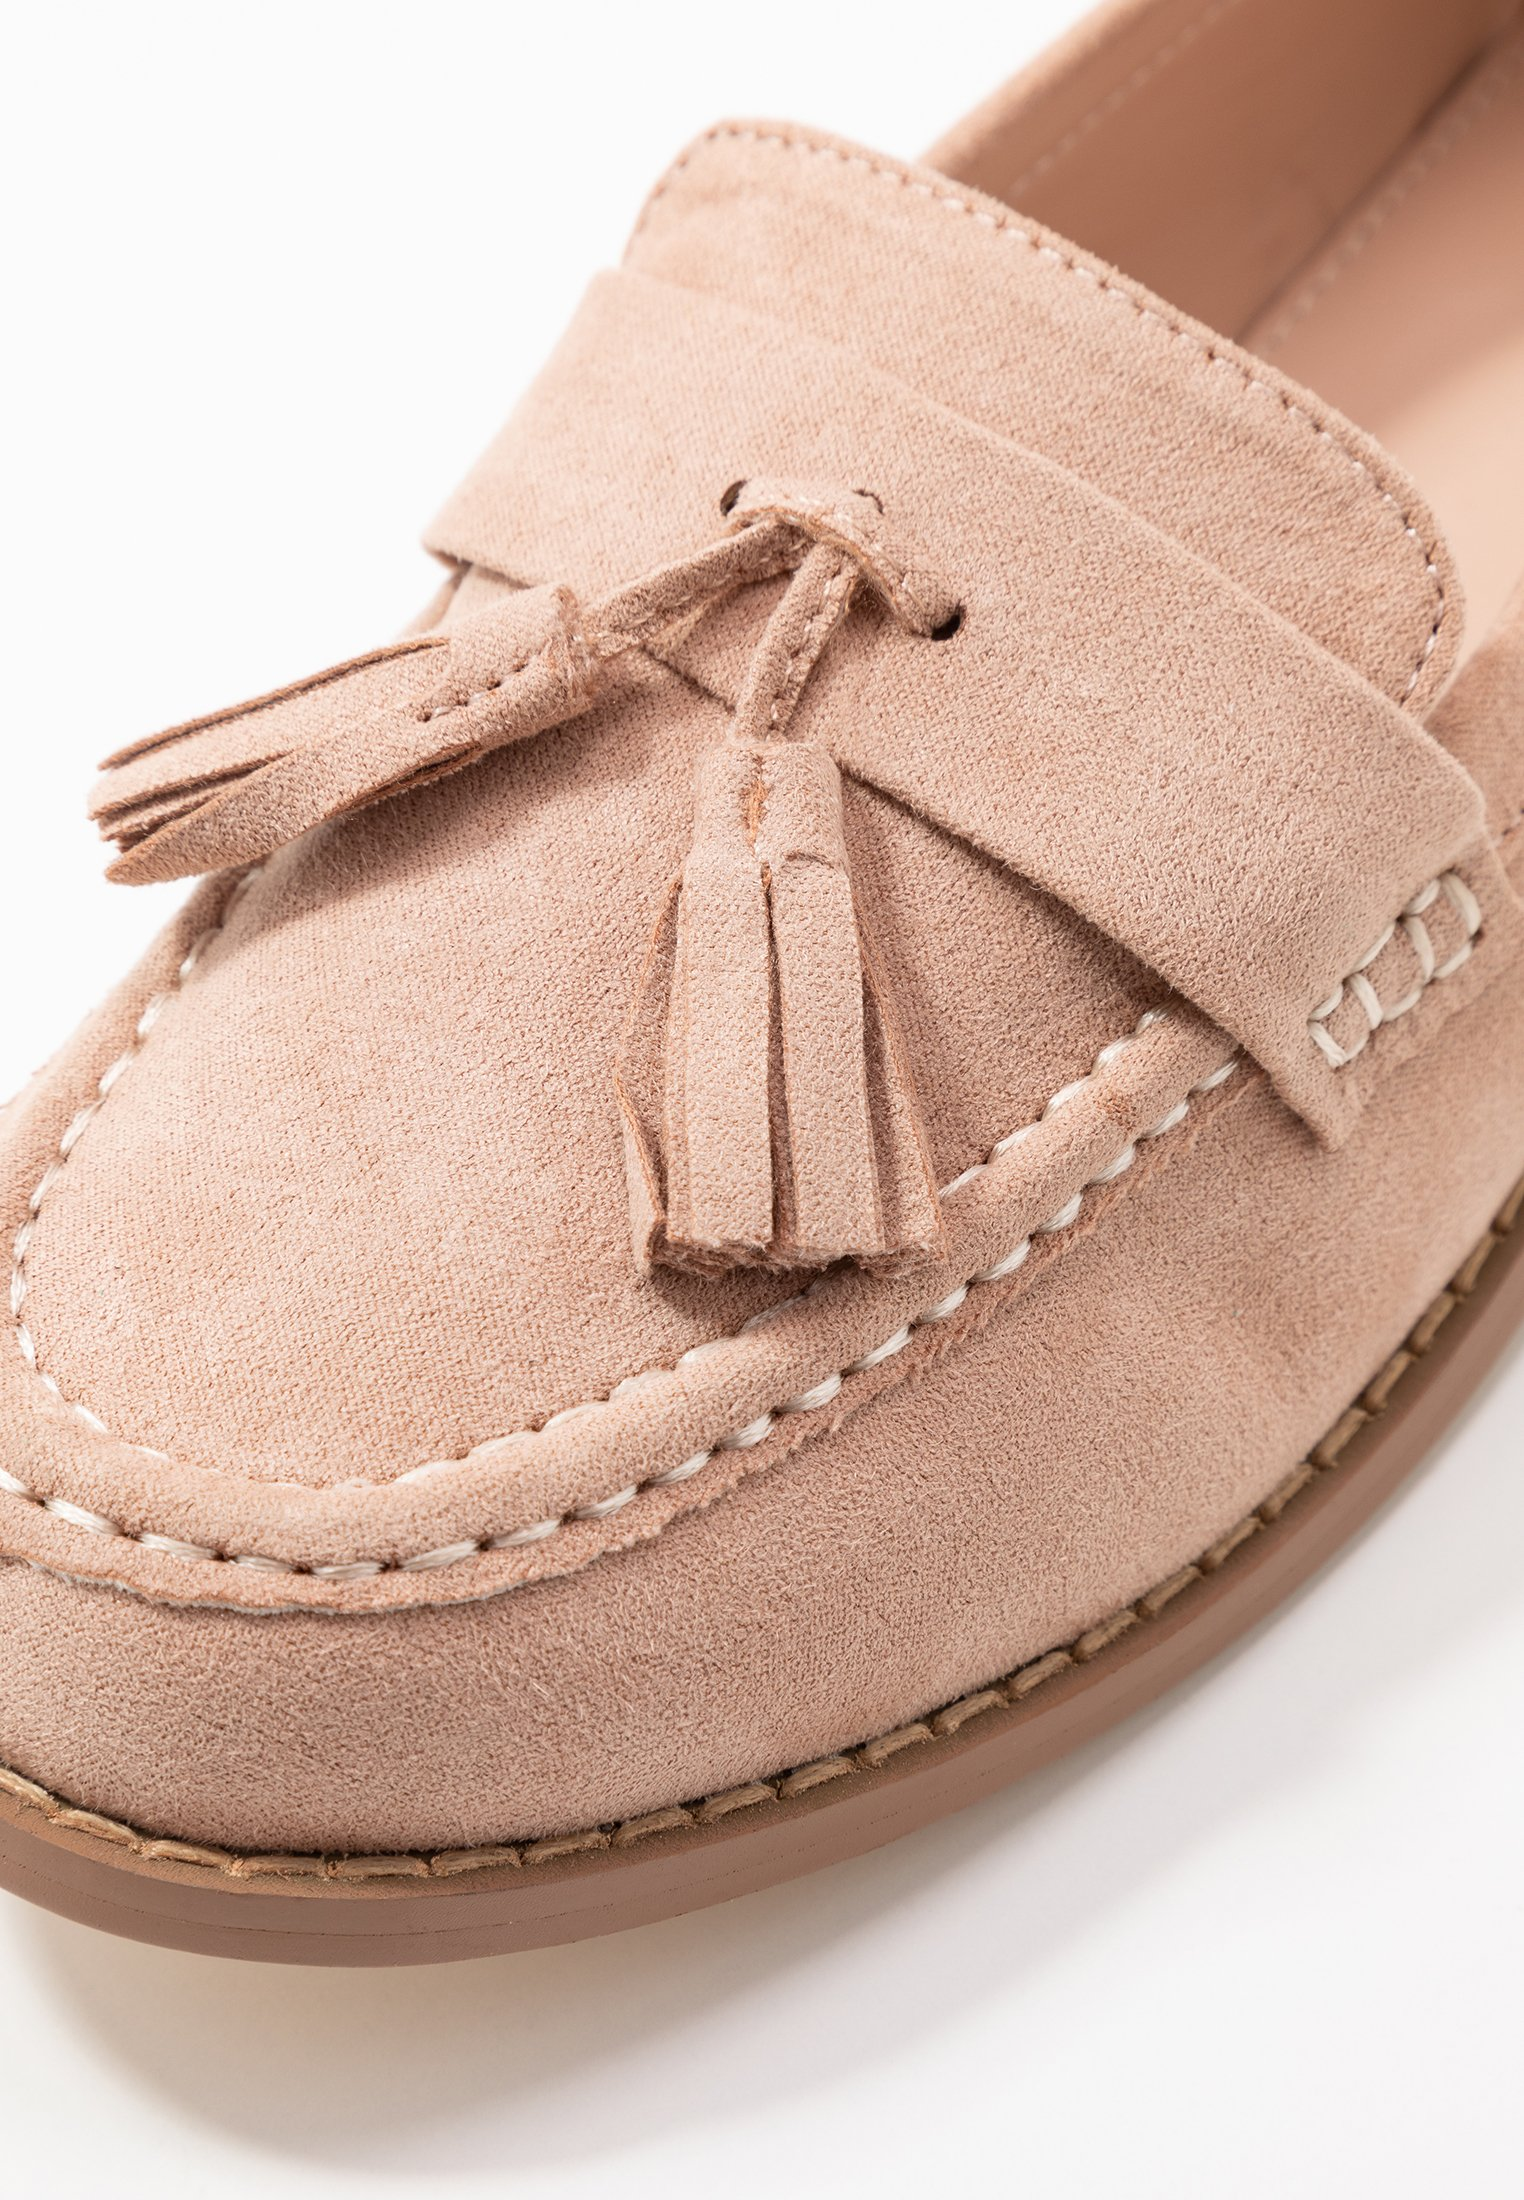 Pink Fit LoaferMocassins Tassel Miss Selfridge Wide JulcTFK31